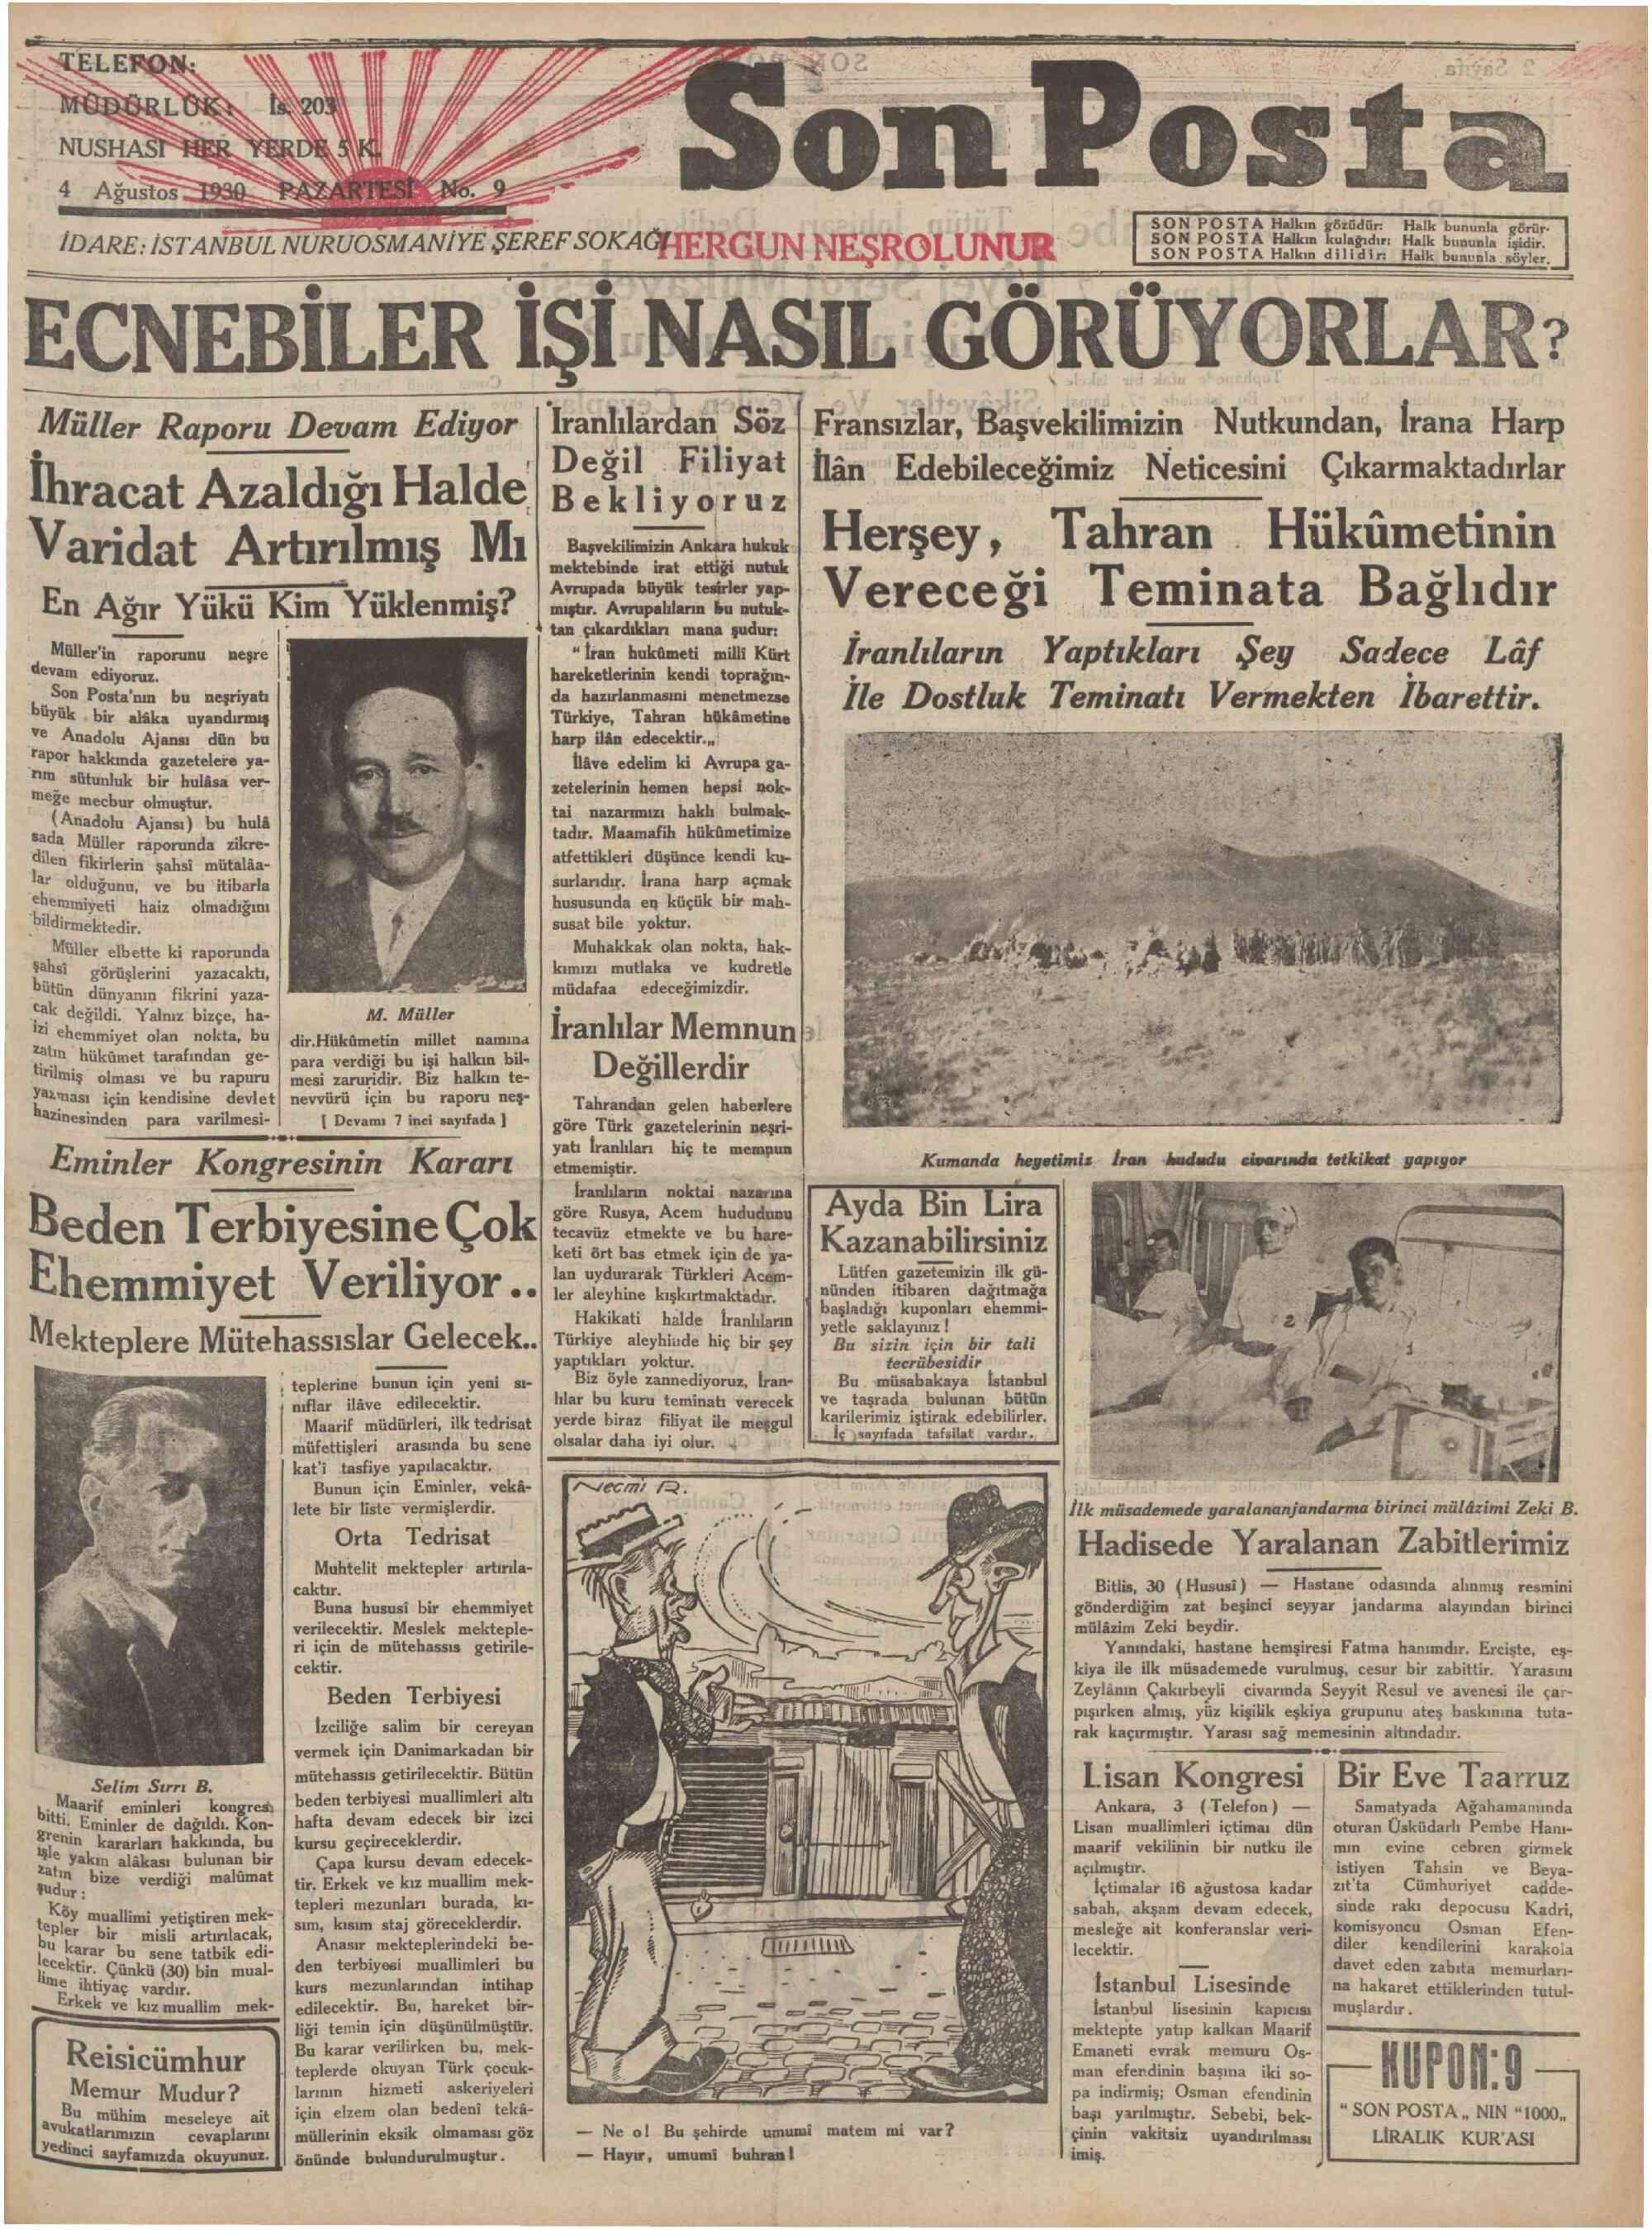 4 Ağustos 1930 Tarihli Son Posta Gazetesi Sayfa 1